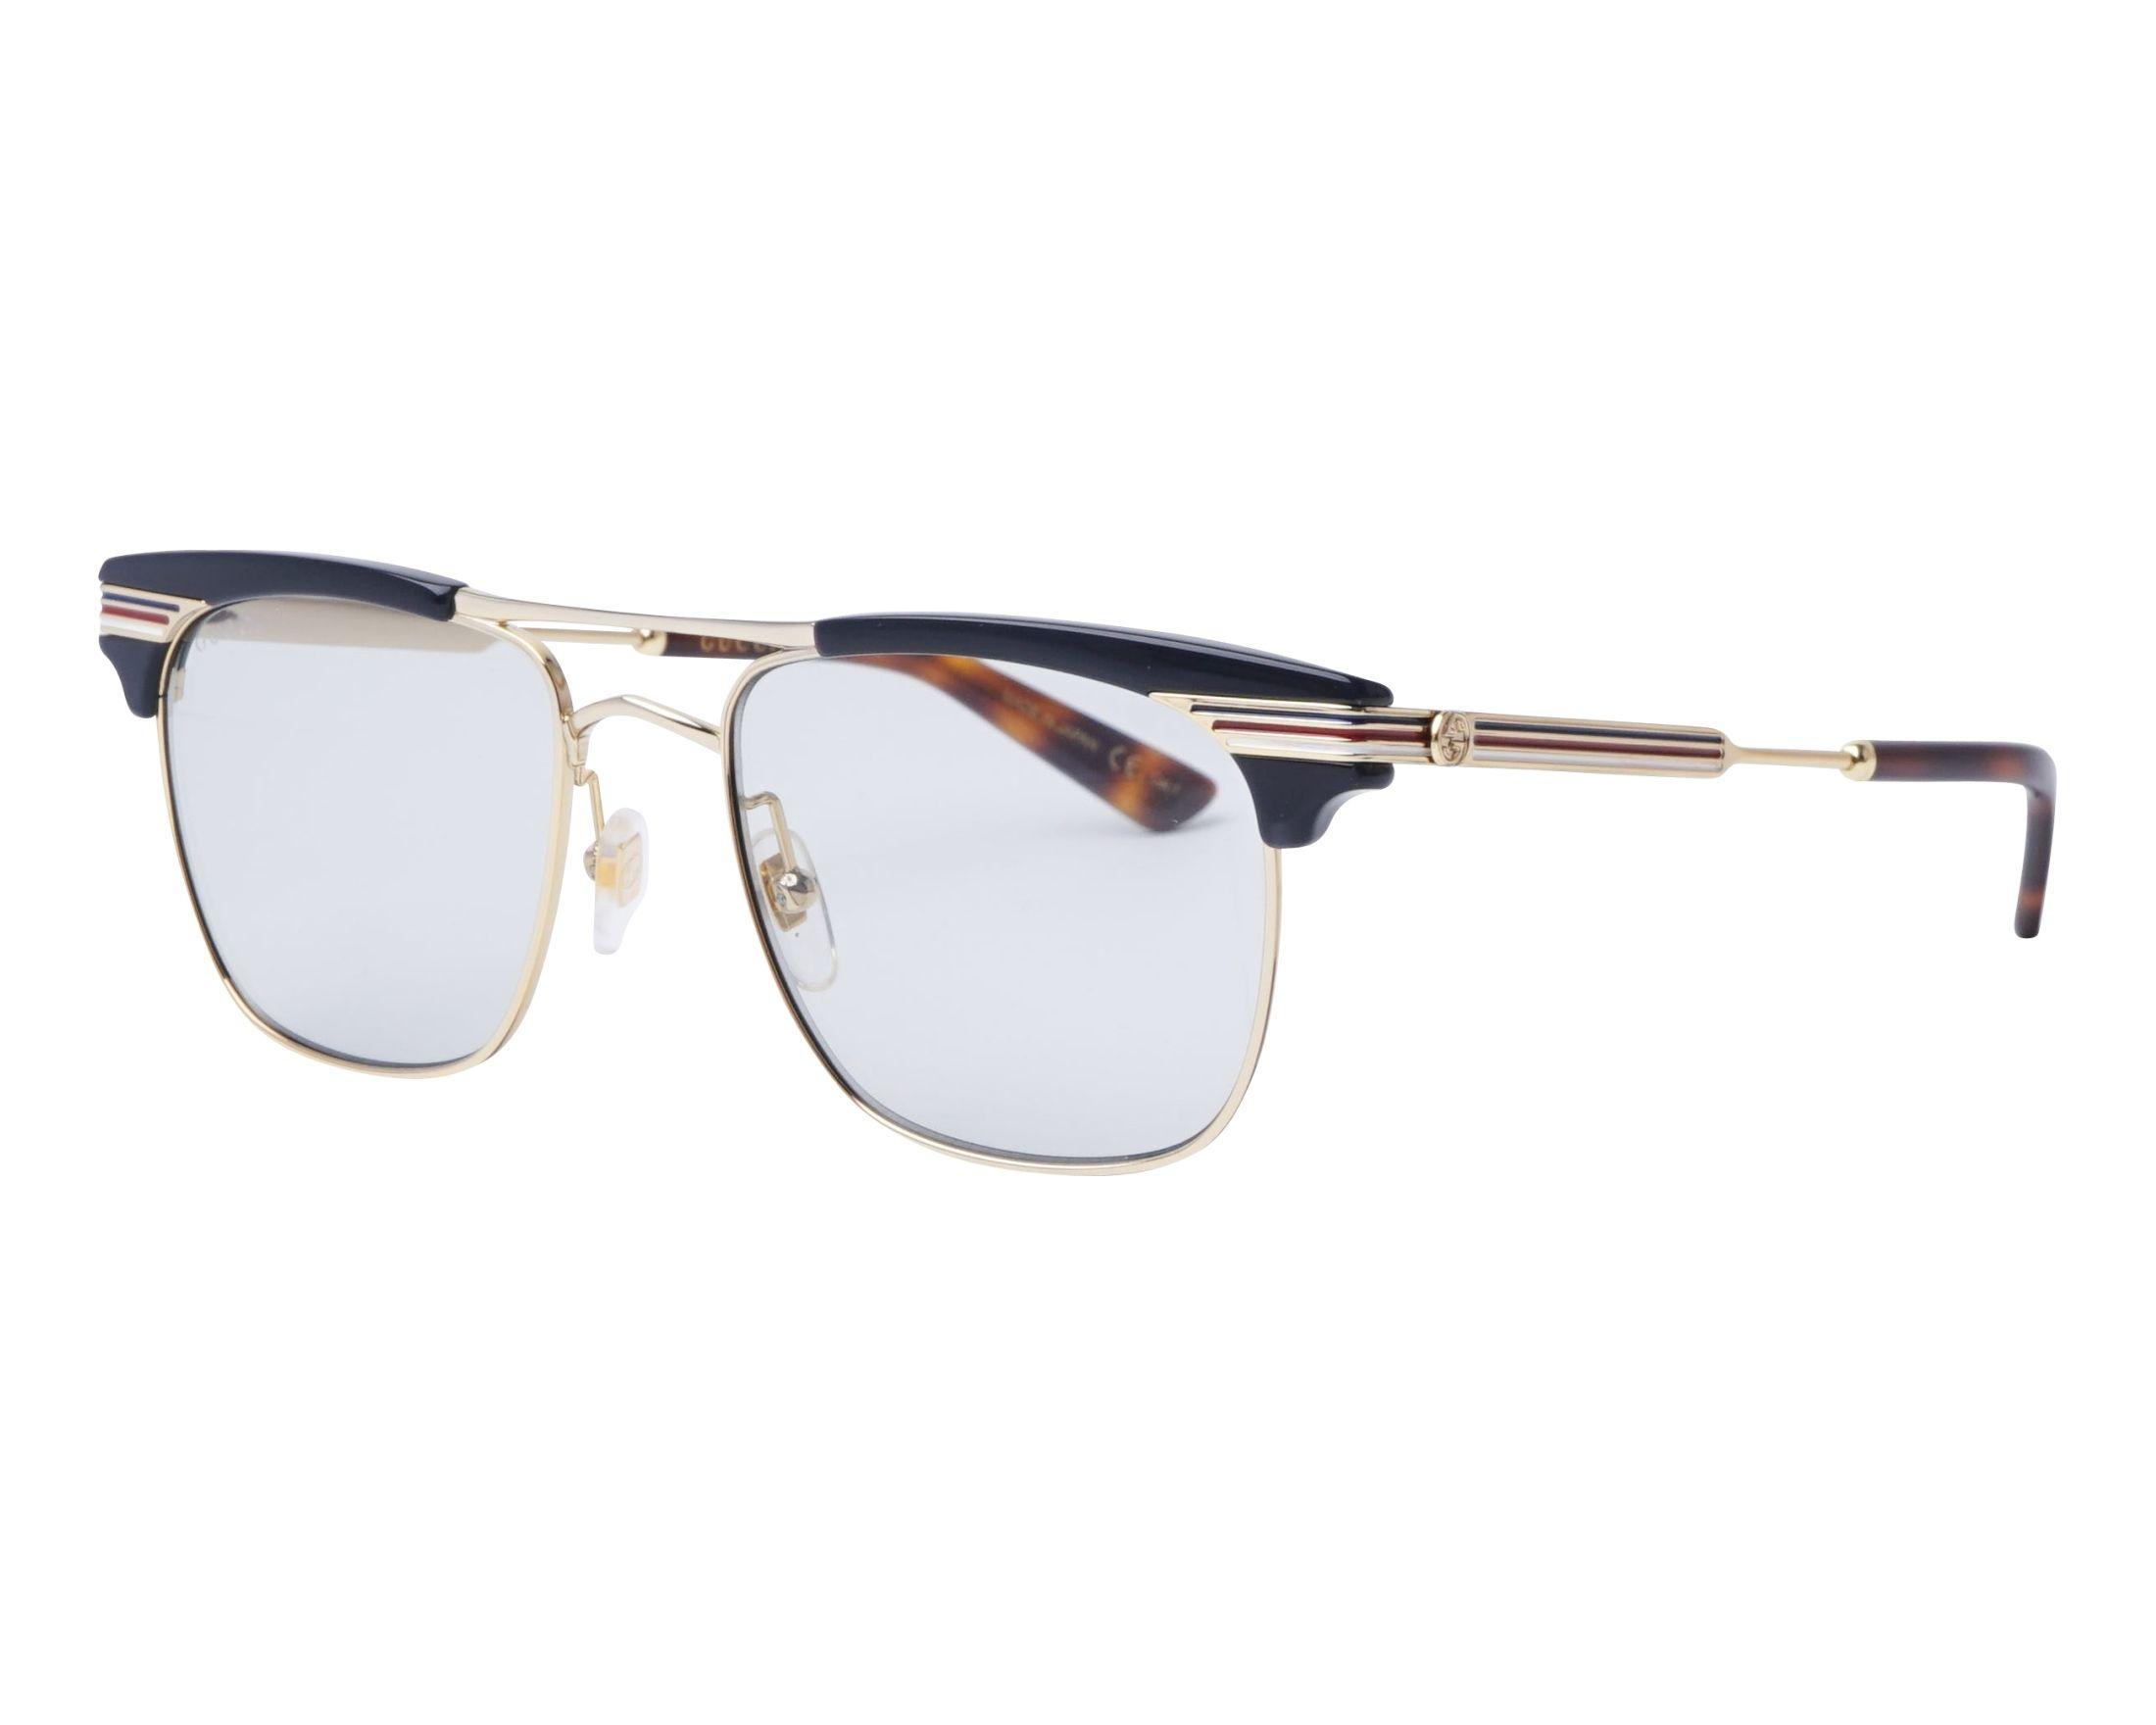 77b6e0d446b eyeglasses Gucci GG-0287-S 006 52-18 Gold Blue profile view